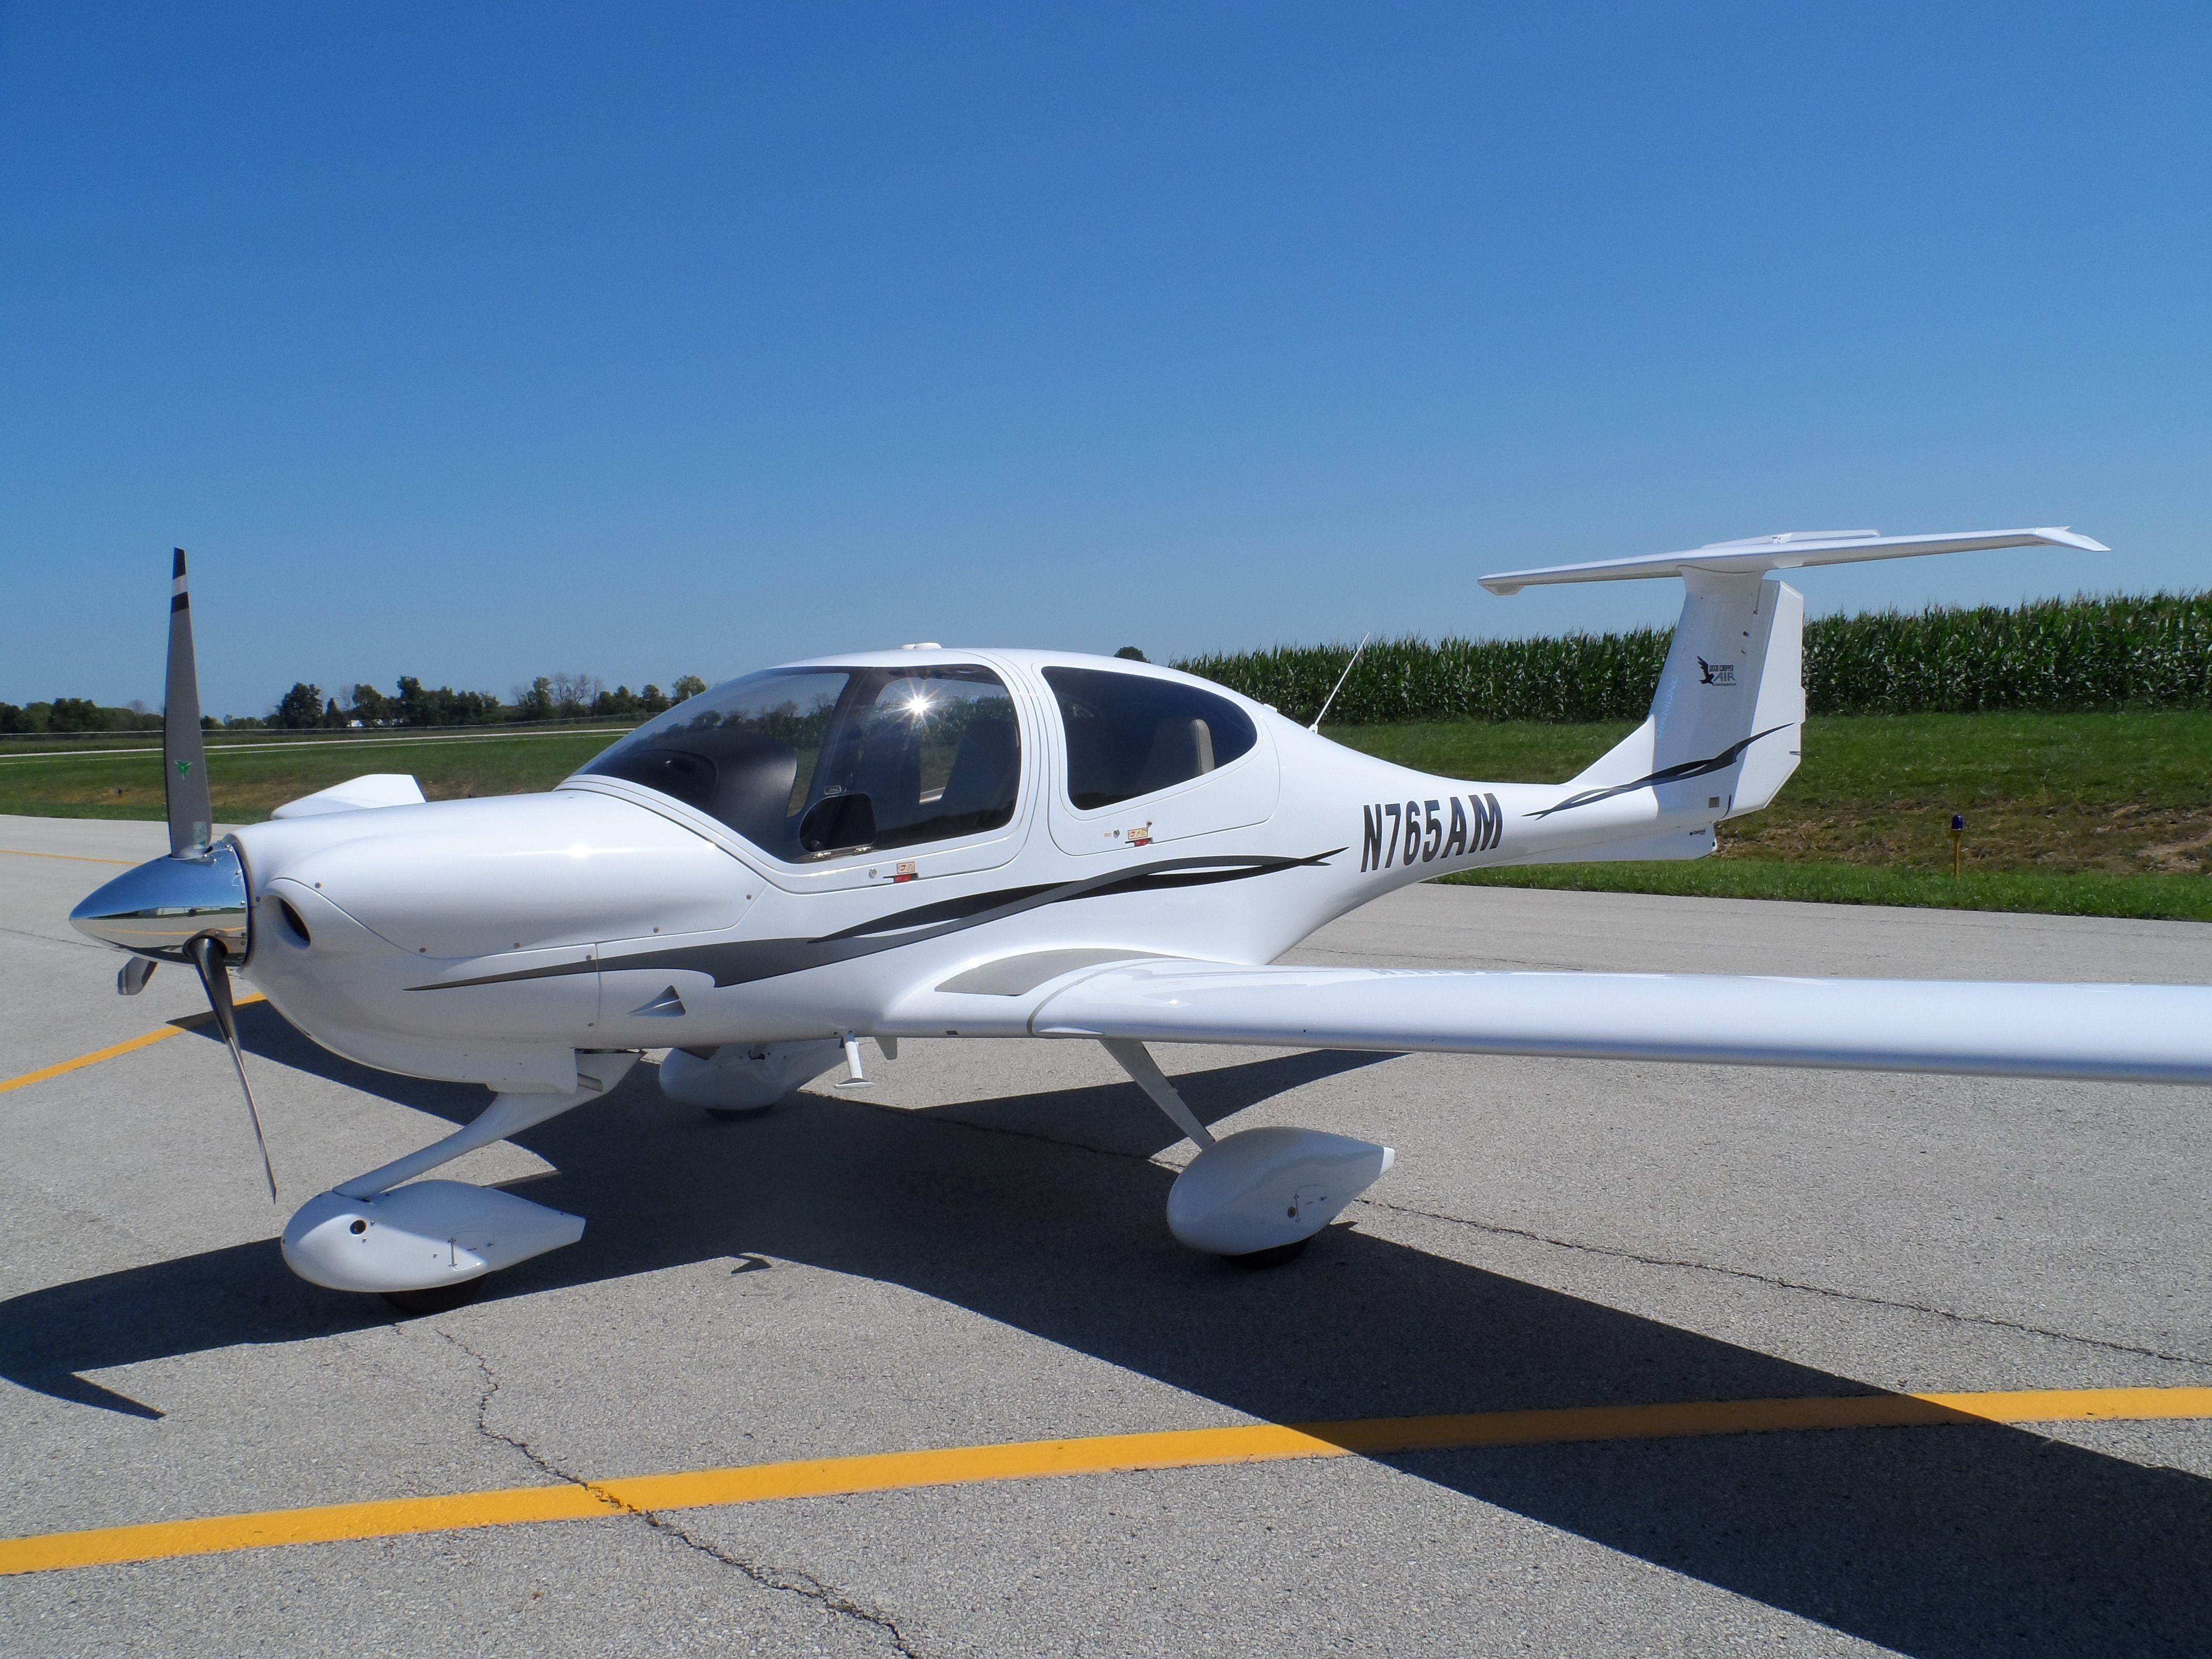 Diamond Da40 Piper Aircraft Aircraft Aviation